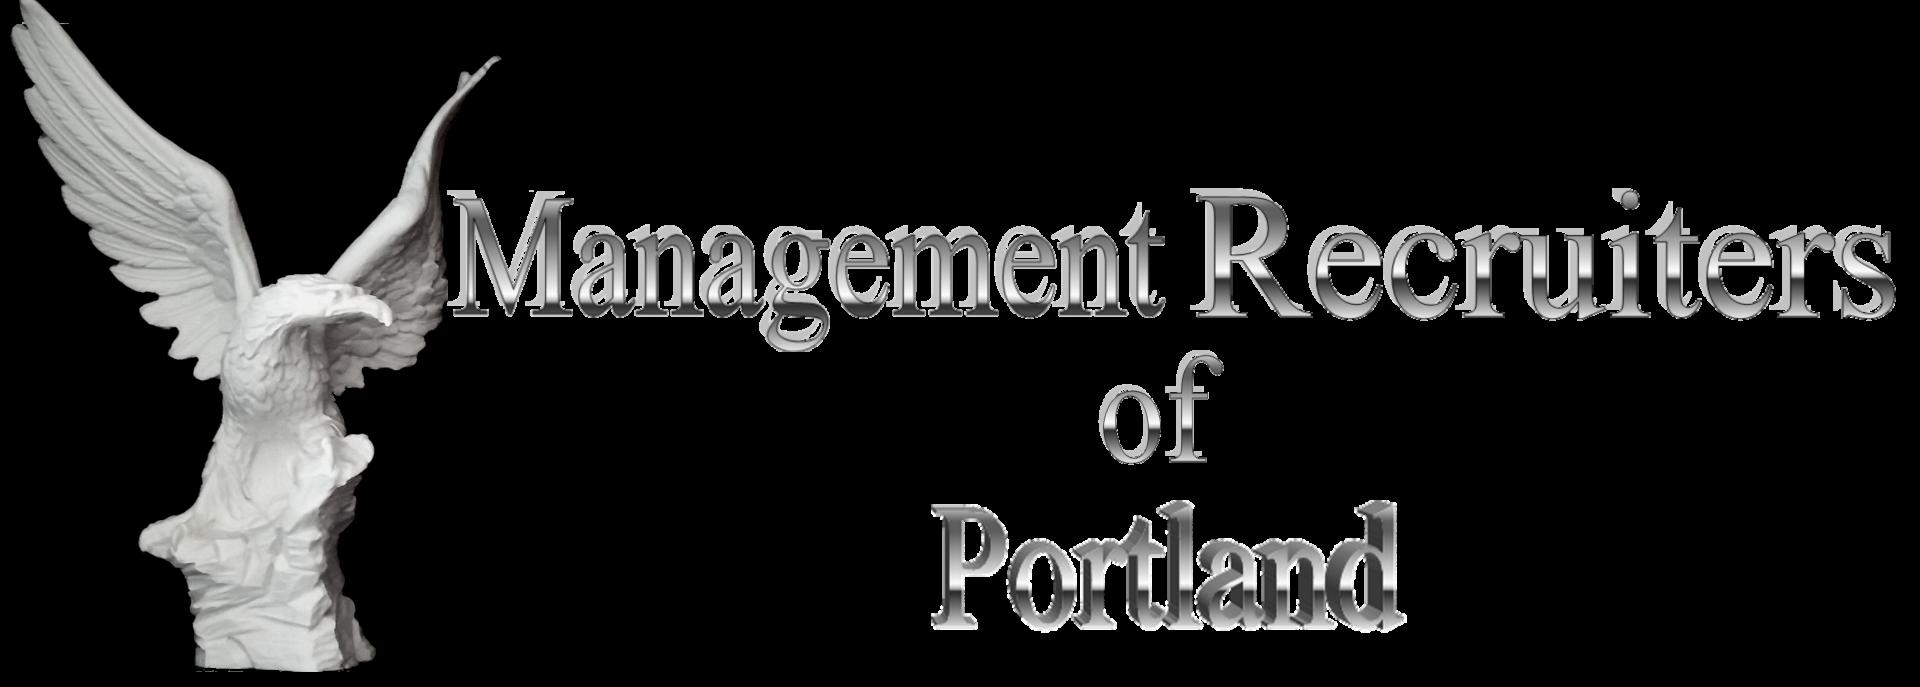 Management Recruiters for Portland Logo